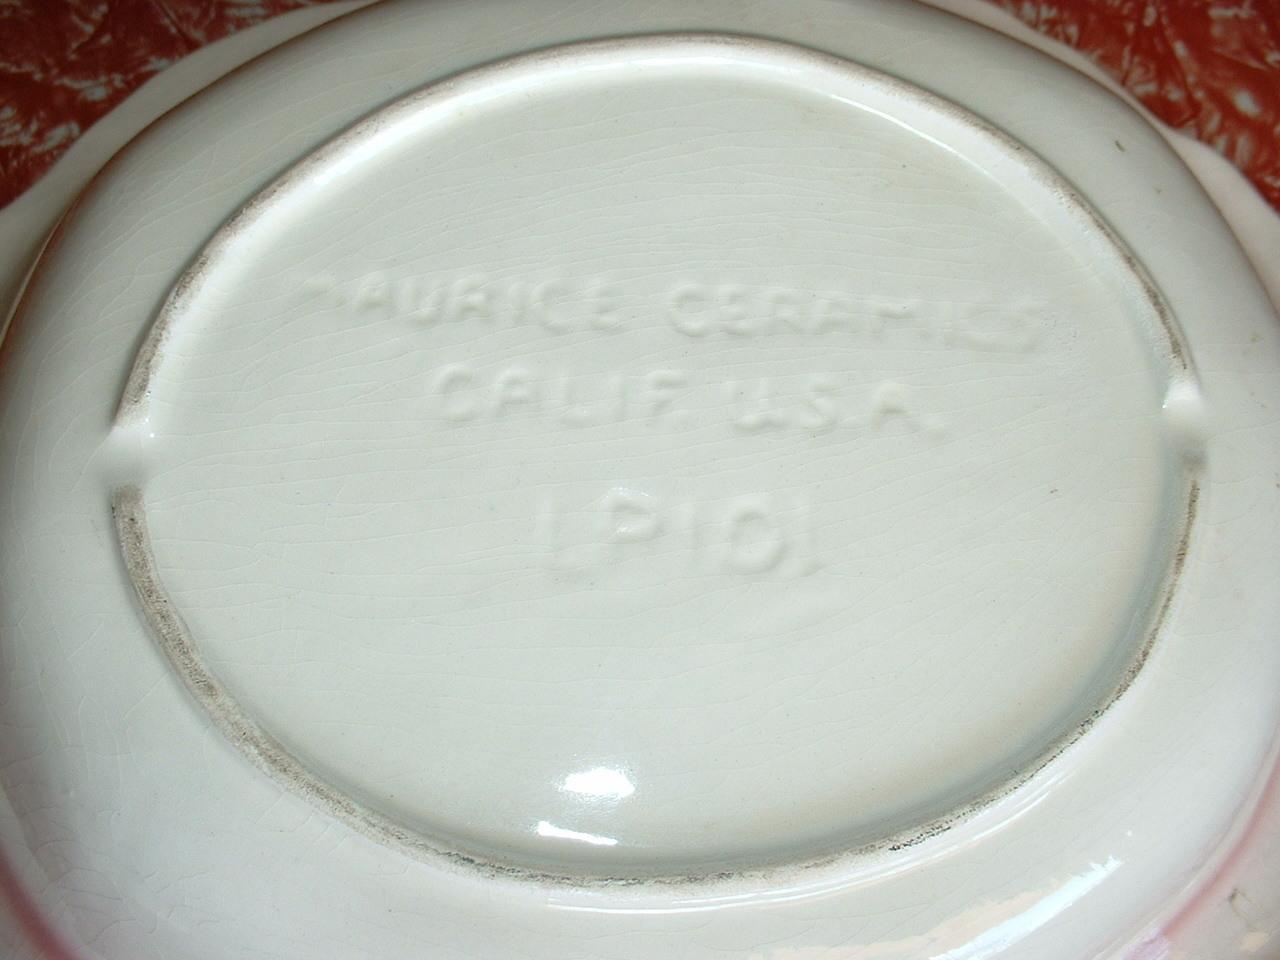 MAURICE CERAMICS of California  large serving dish; LP101